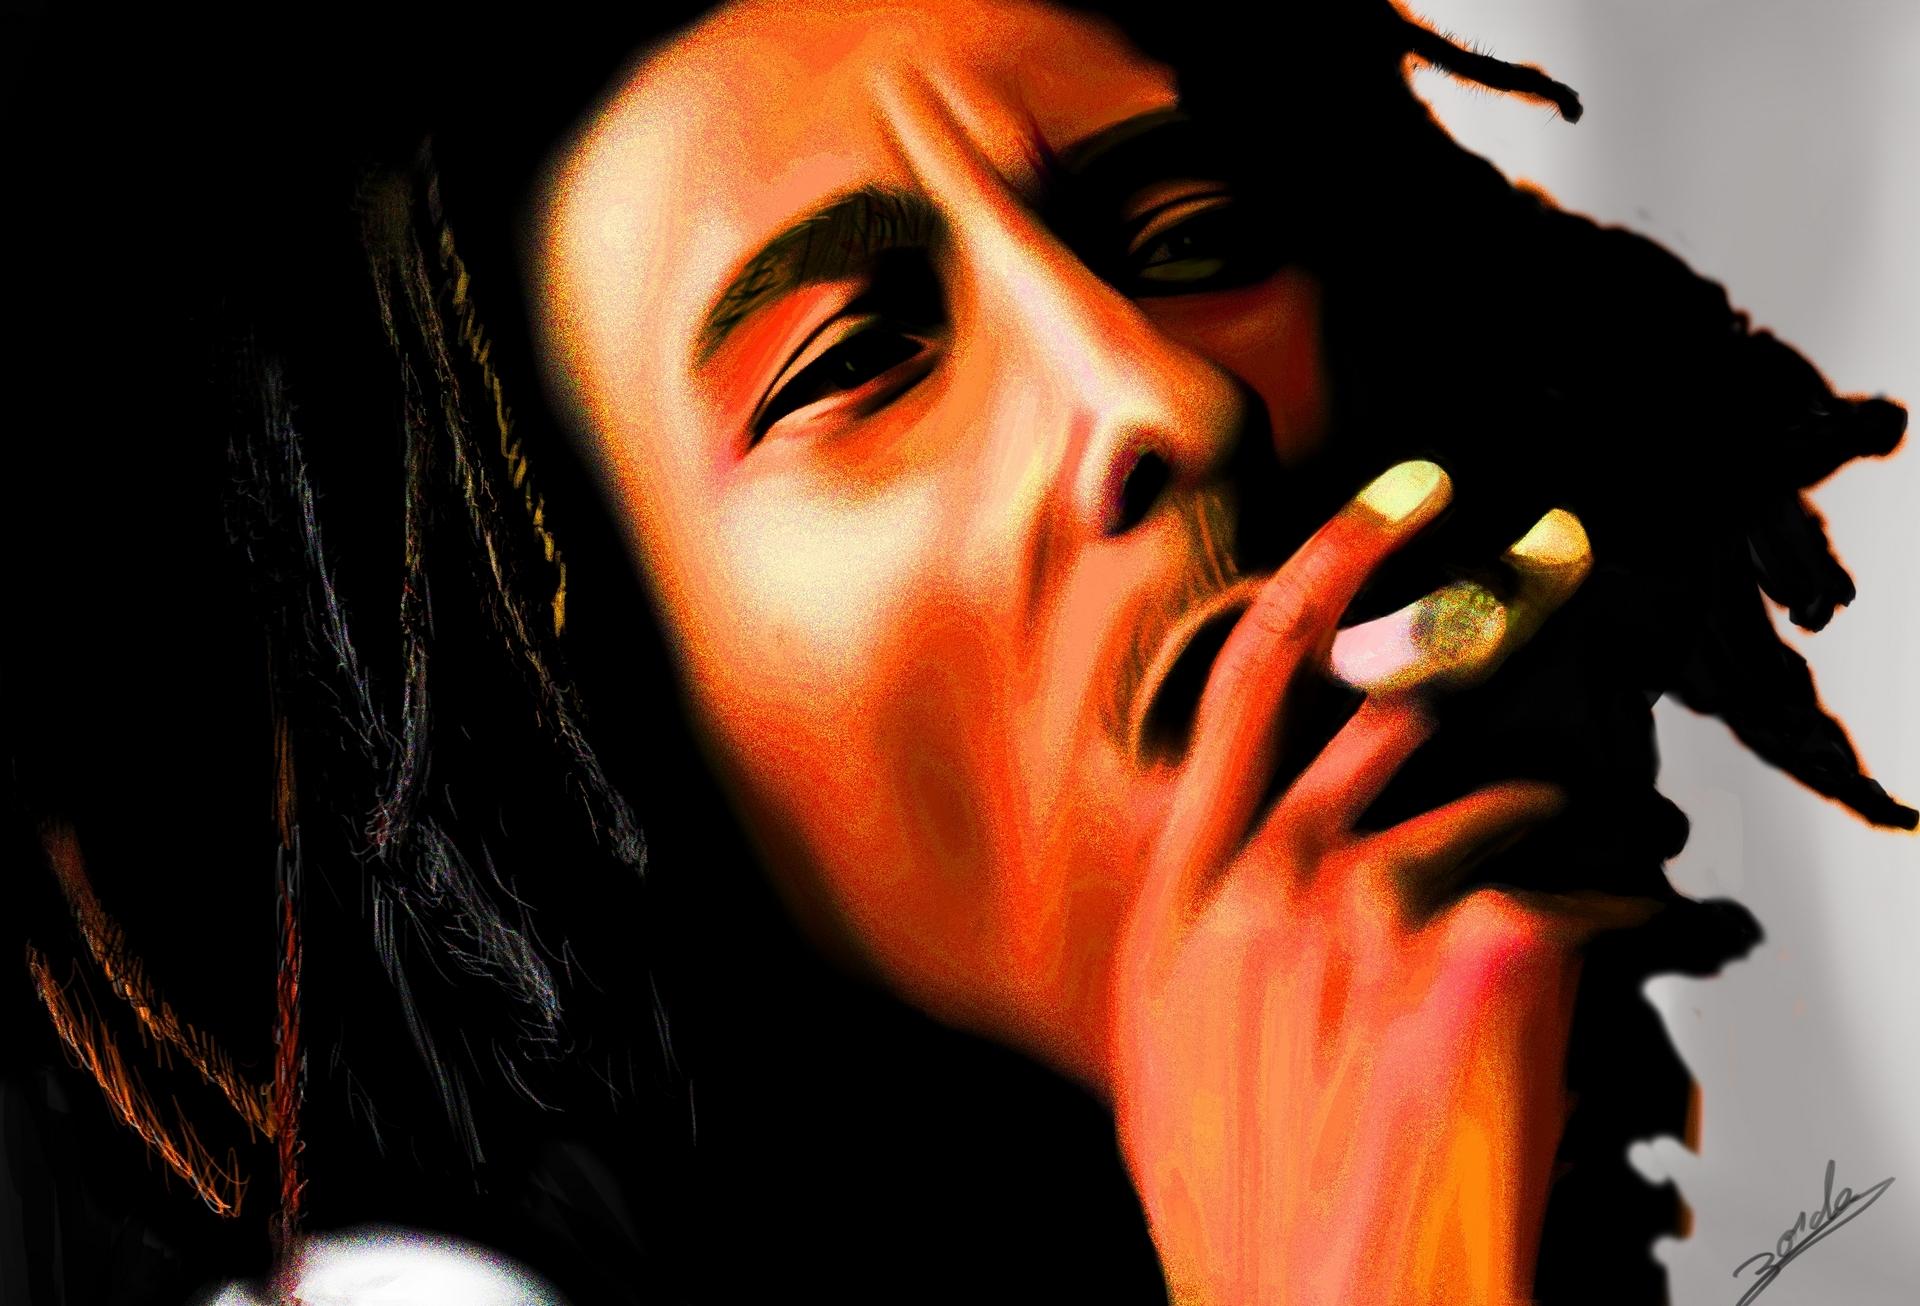 Bob Marley 鲍勃·马利壁纸